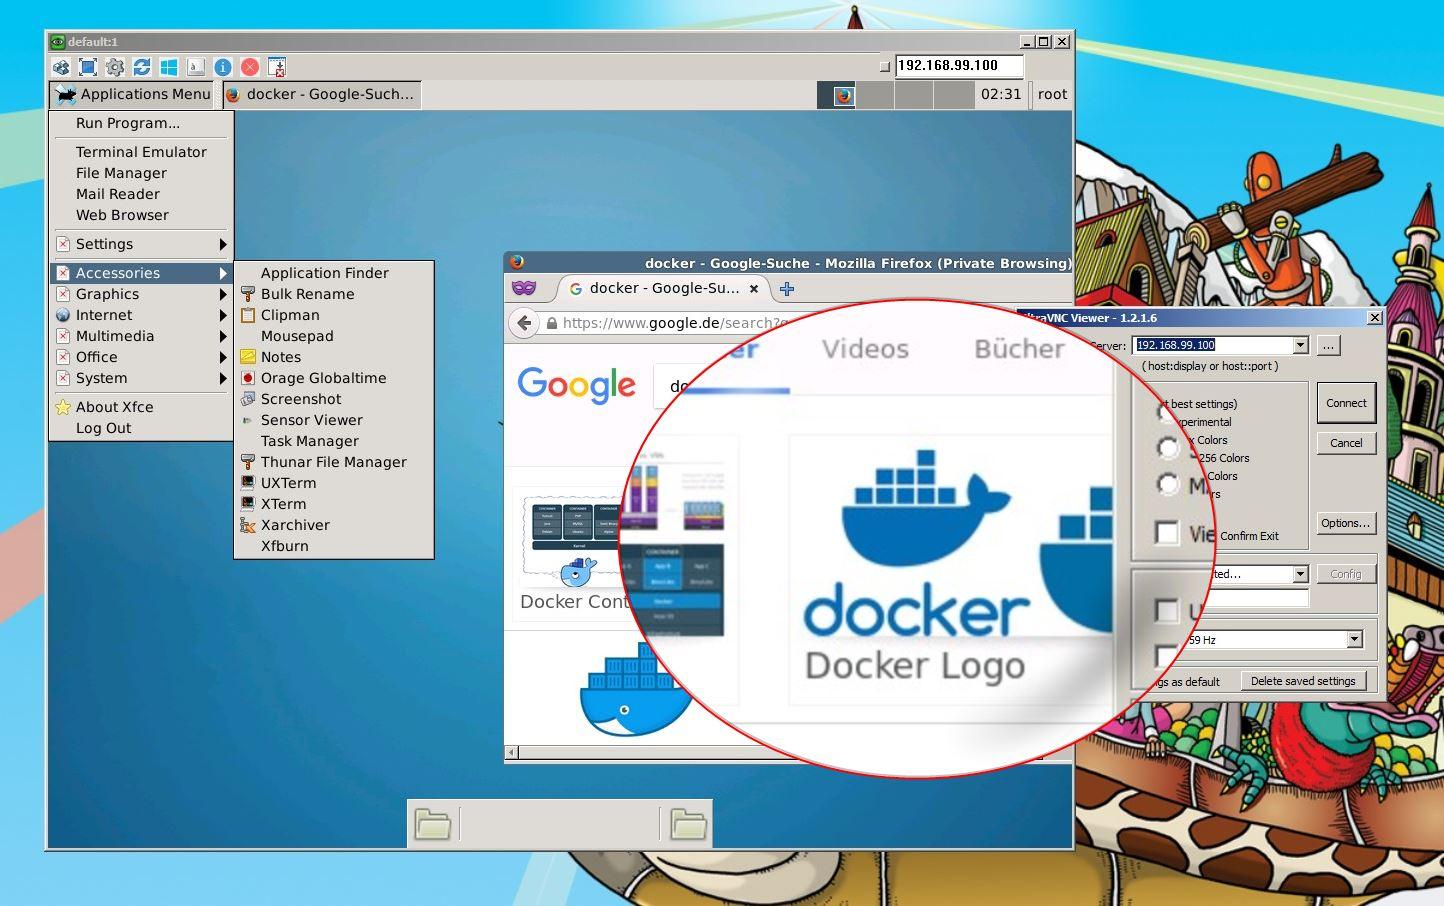 Ubuntu-Desktop per) Docker-Container unter Windows nutzen - adé VM ...